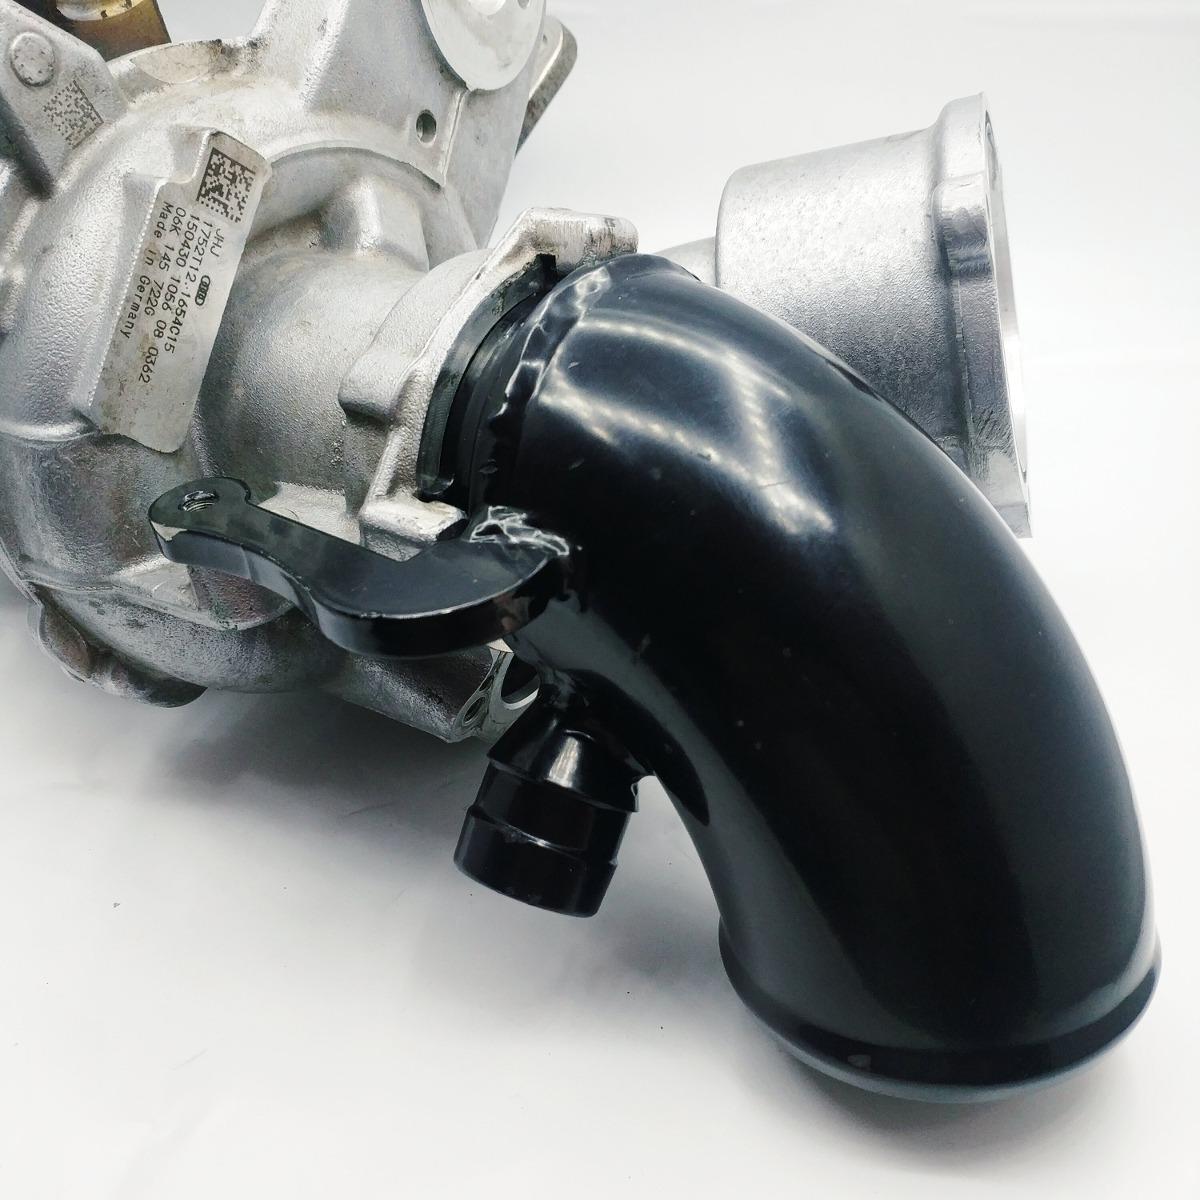 Turbo Inlet Pipe Mqb Cupra Gti Audi S3 Golf R Is12 Is38